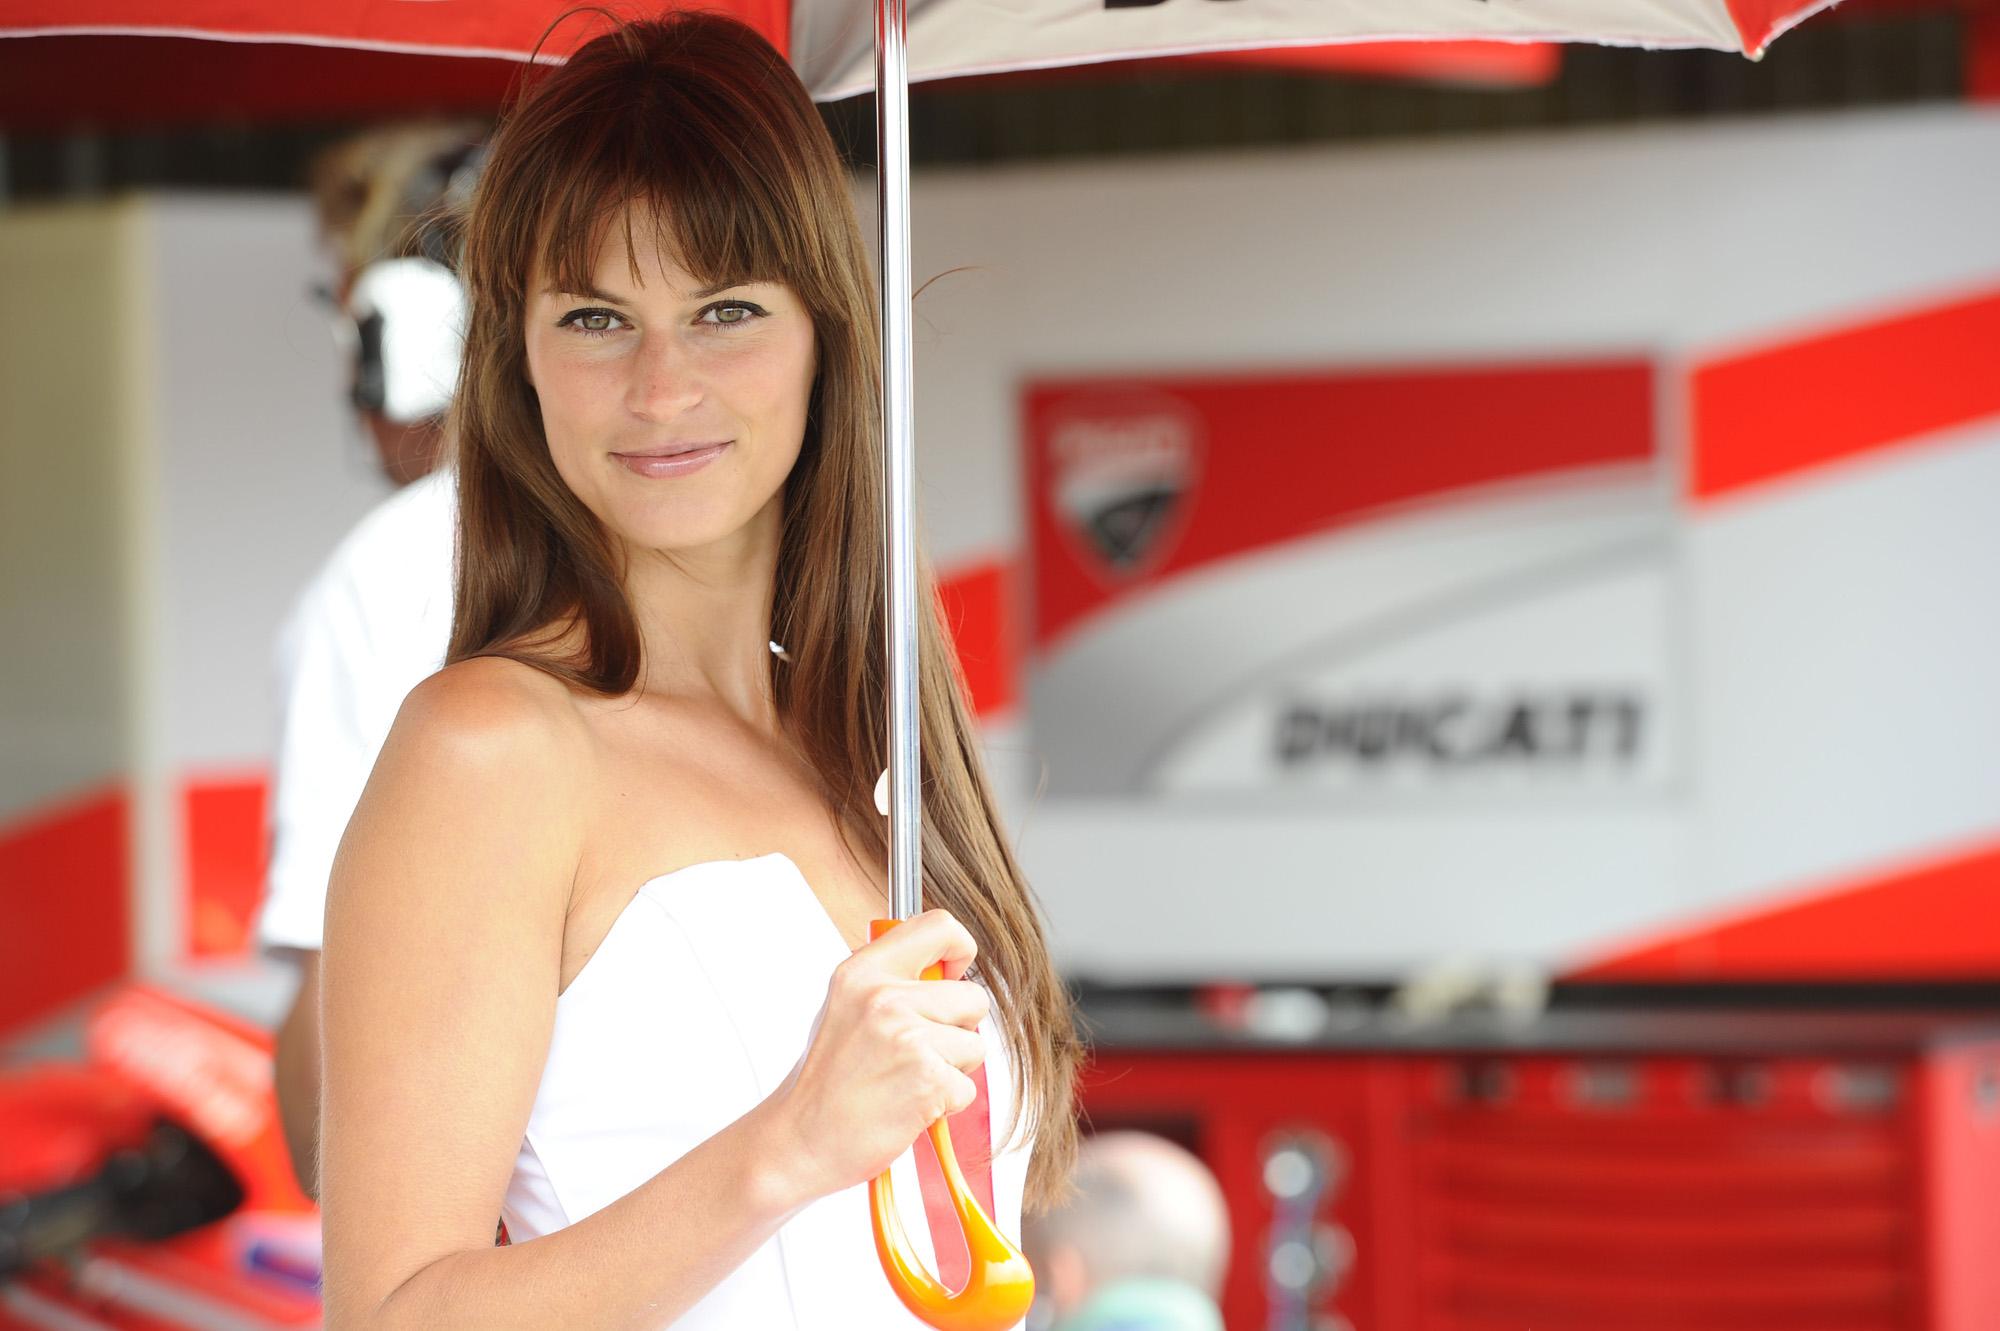 MotoGP Czech Republic Paddock girls 2013 | Visordown